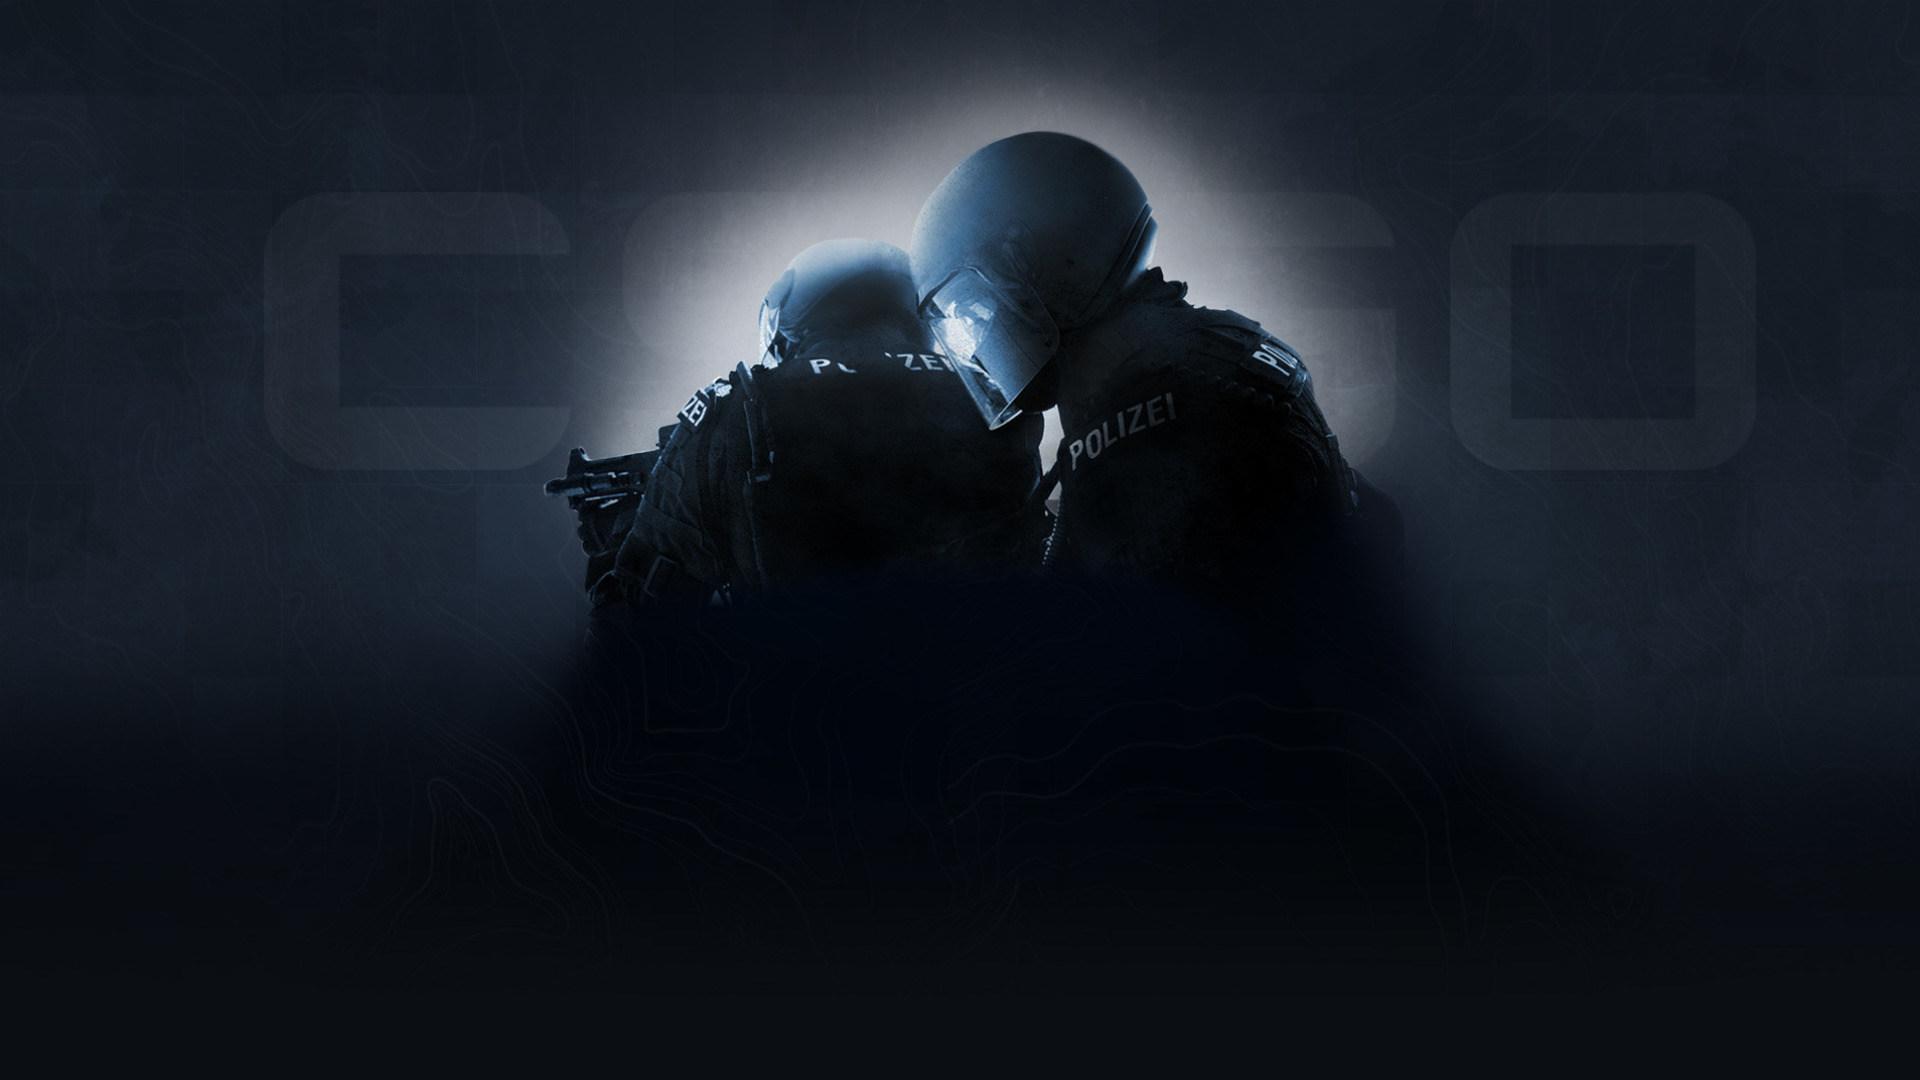 Steam, Valve, Counter Strike, Global Offensive, cs:go, Counter-Strike: Global Offensive